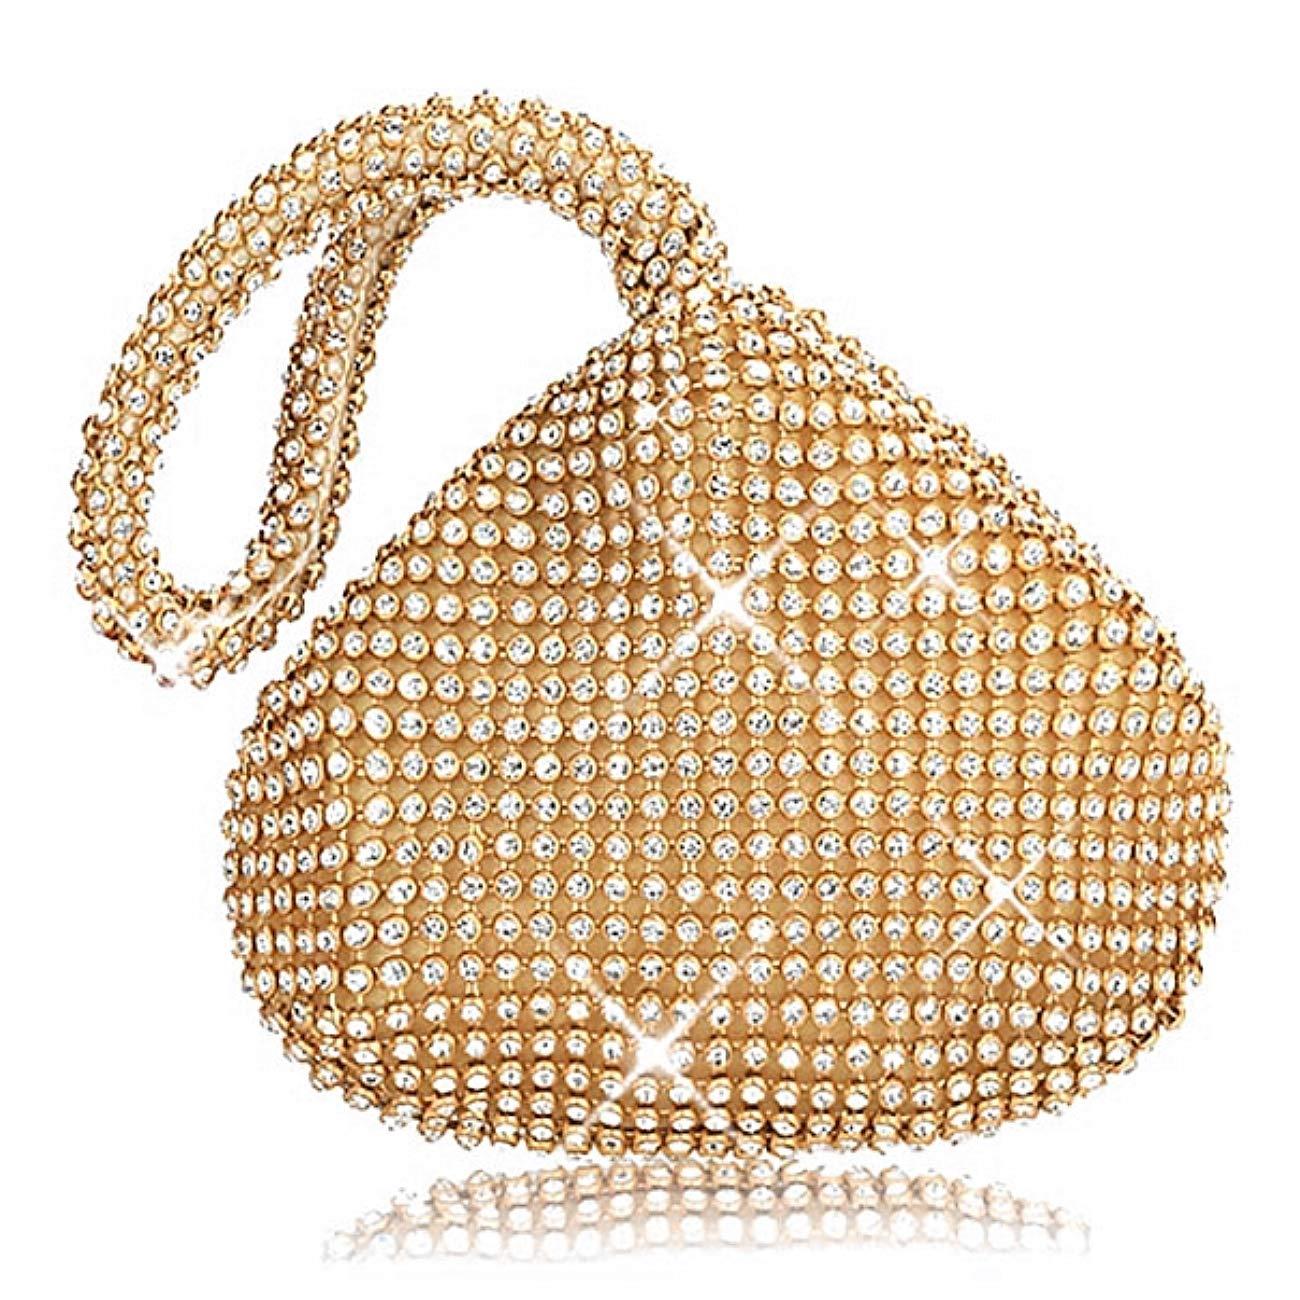 Mondeer Evening Purse Bag Clutch Handbag Sparkly Mini Glitter Crystal Diamante Pouch Shaped Wrist Hand Bag Purse Bag Party Bridal Prom Fashion For Women Ladies Girls